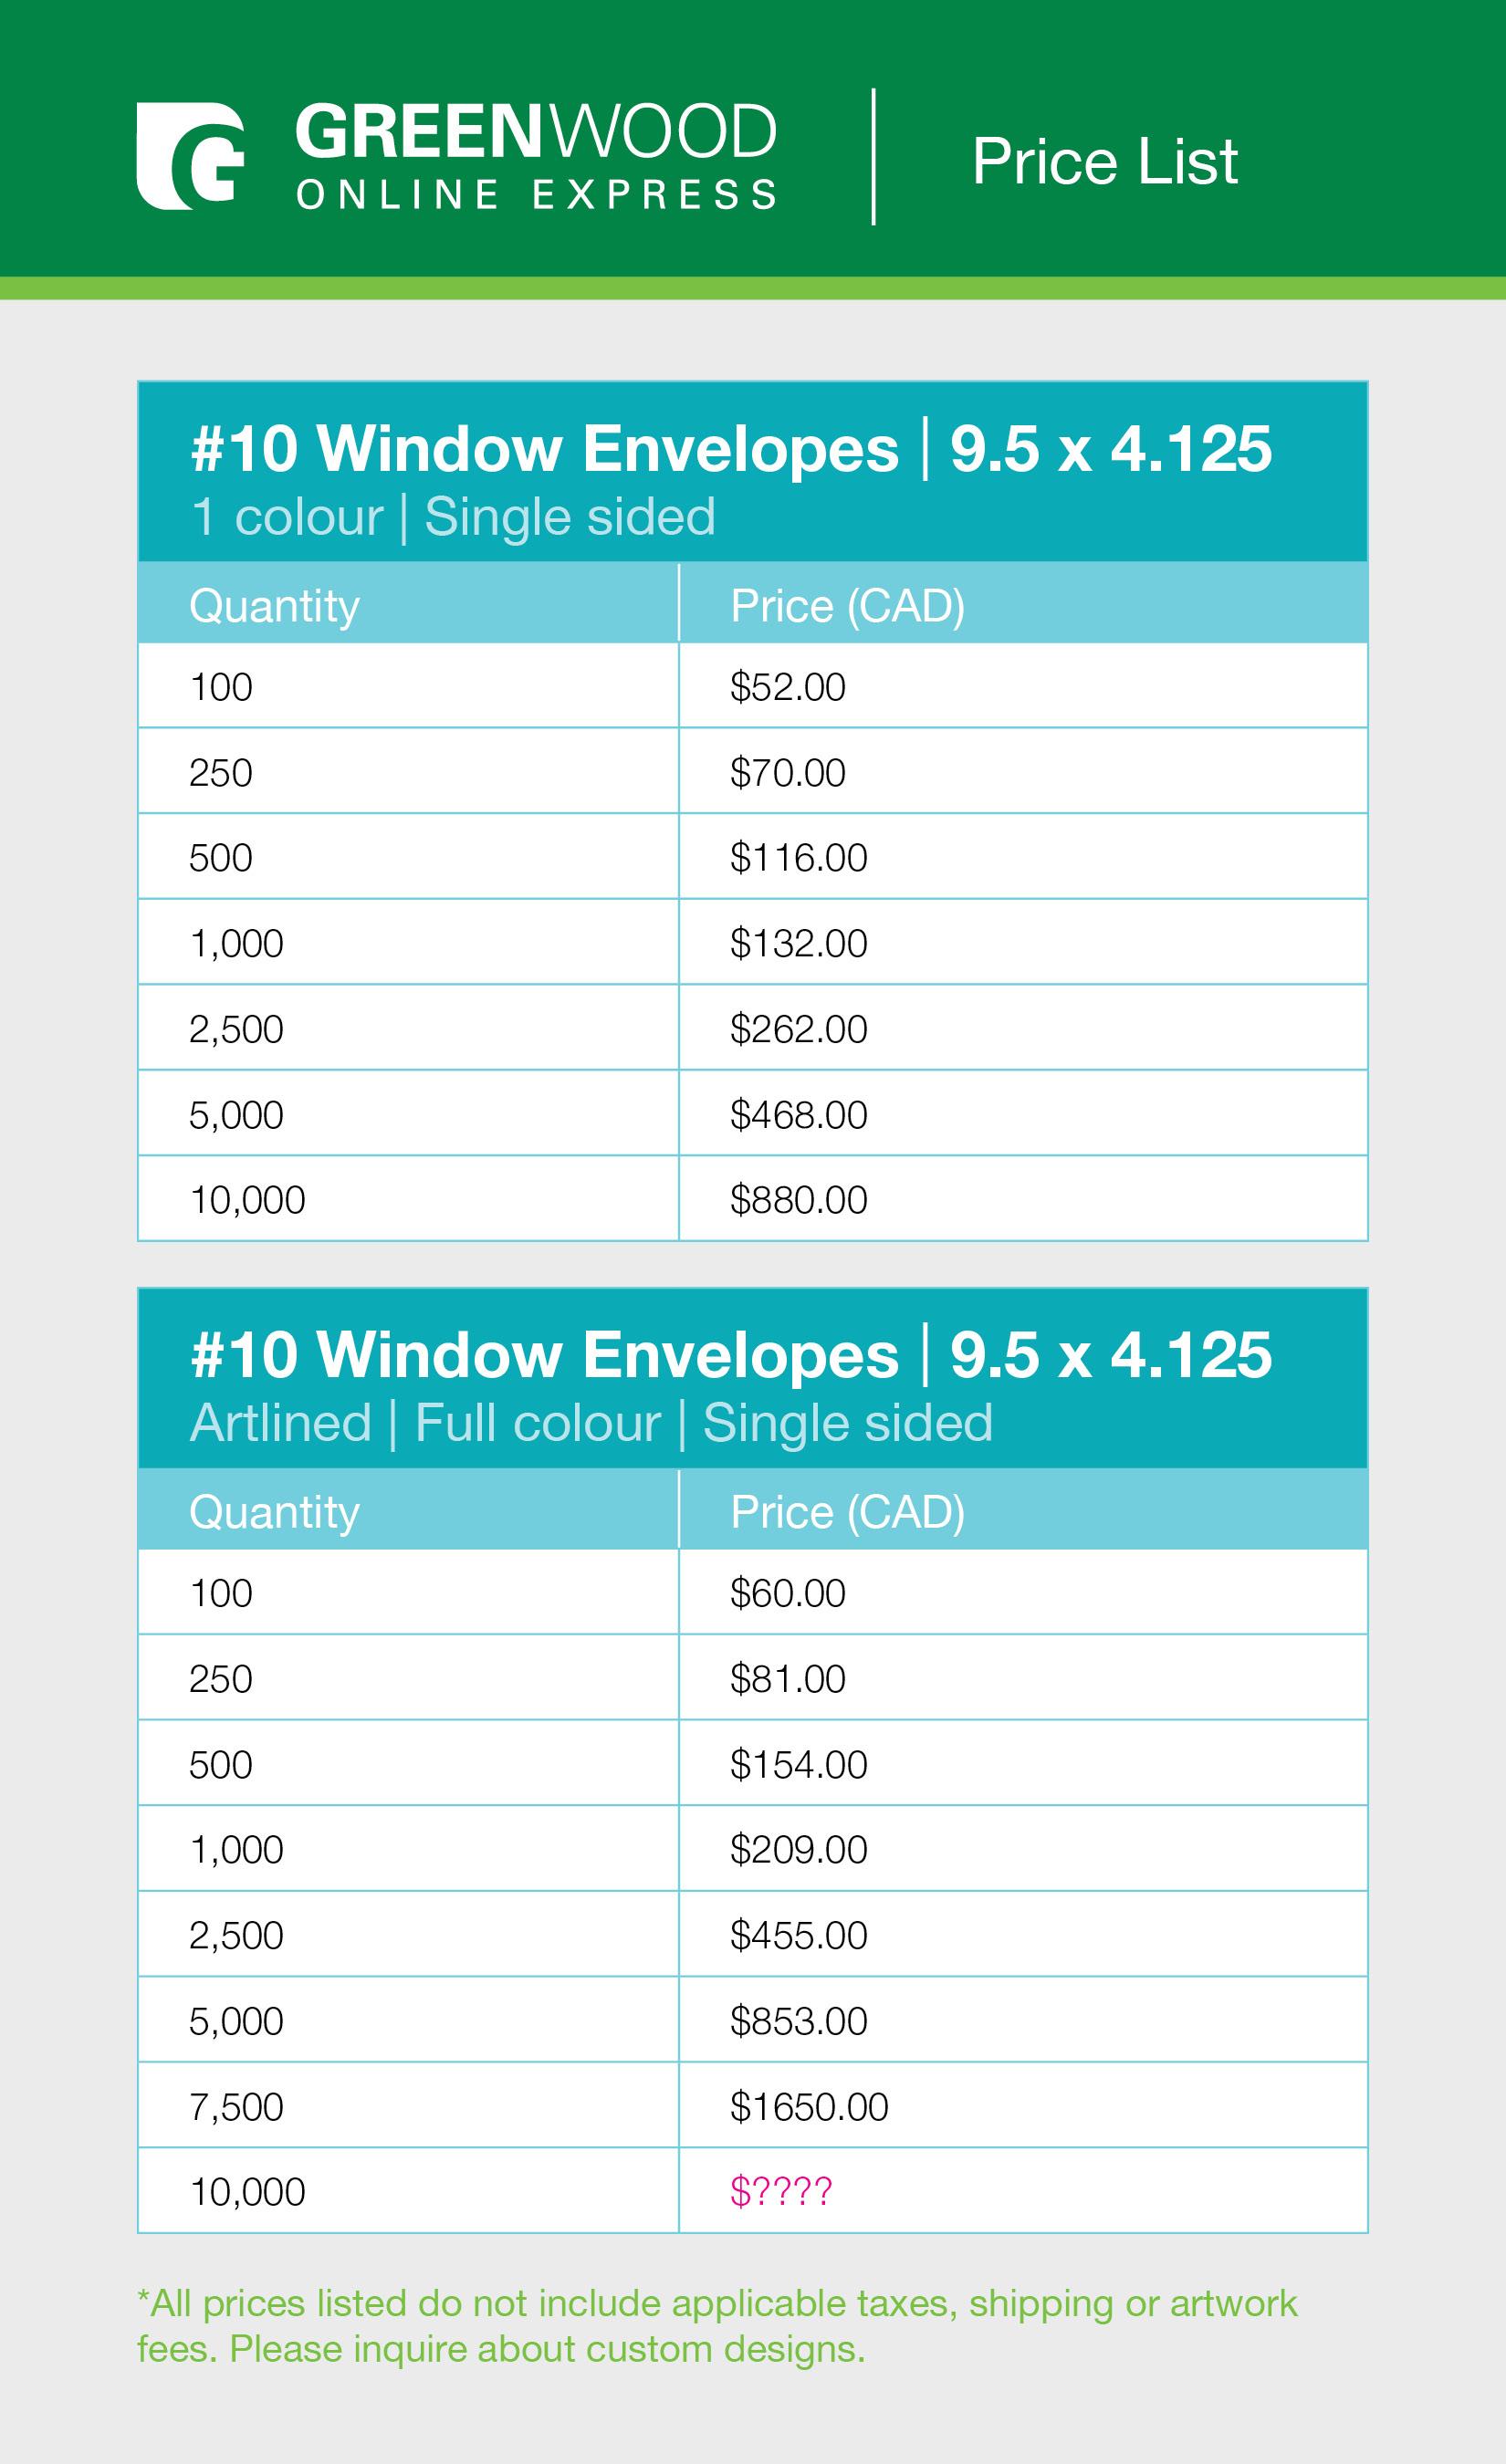 Greenwood #10 Window Envelopes colour single sided price list.jpg